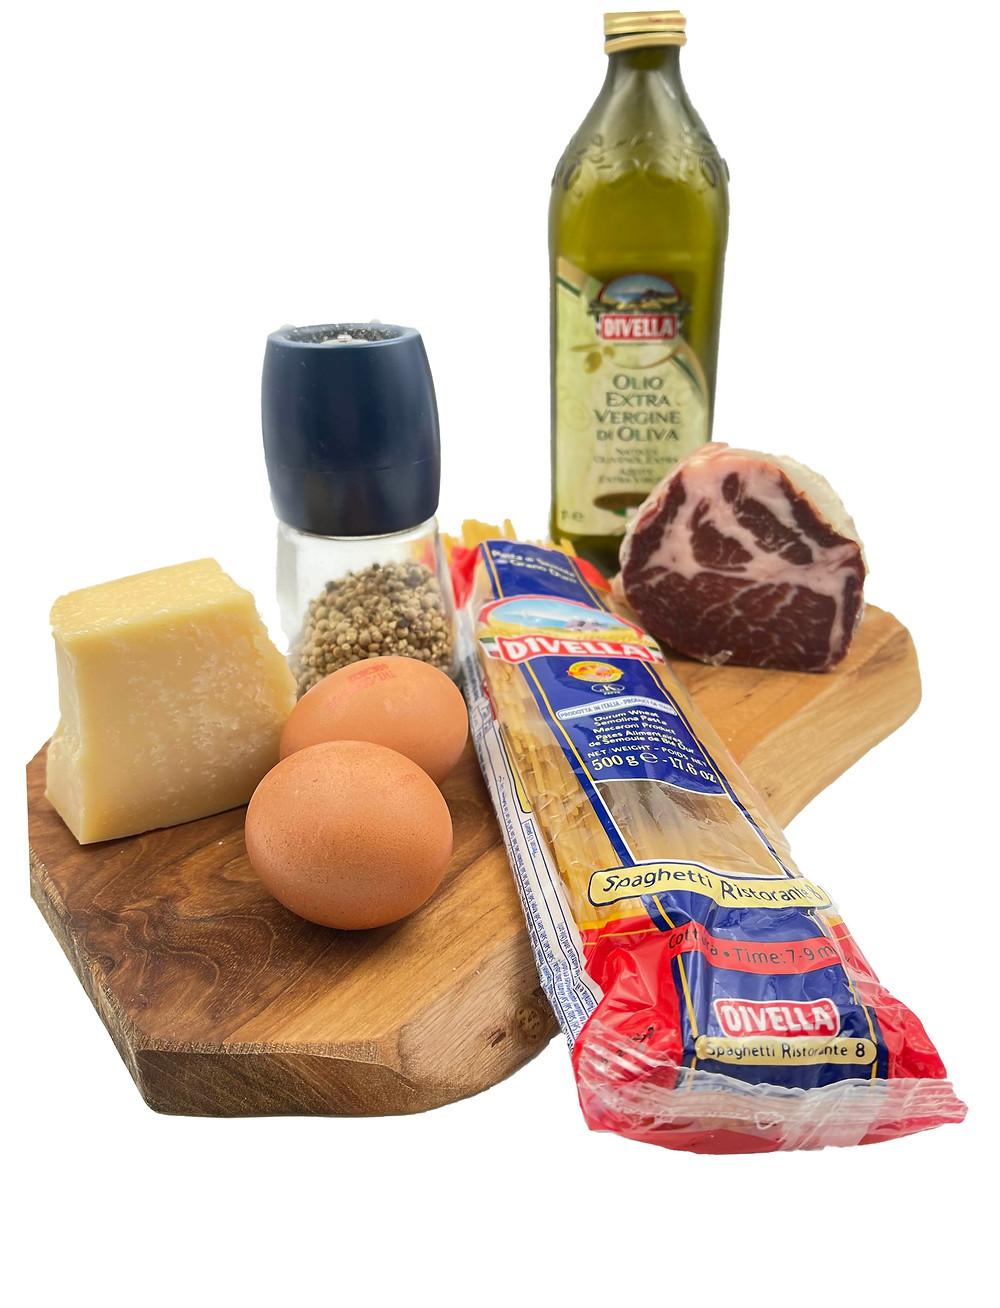 Spaghetti Divella, huile d'olive Divella, coppa Negrini, parmesan Soresina